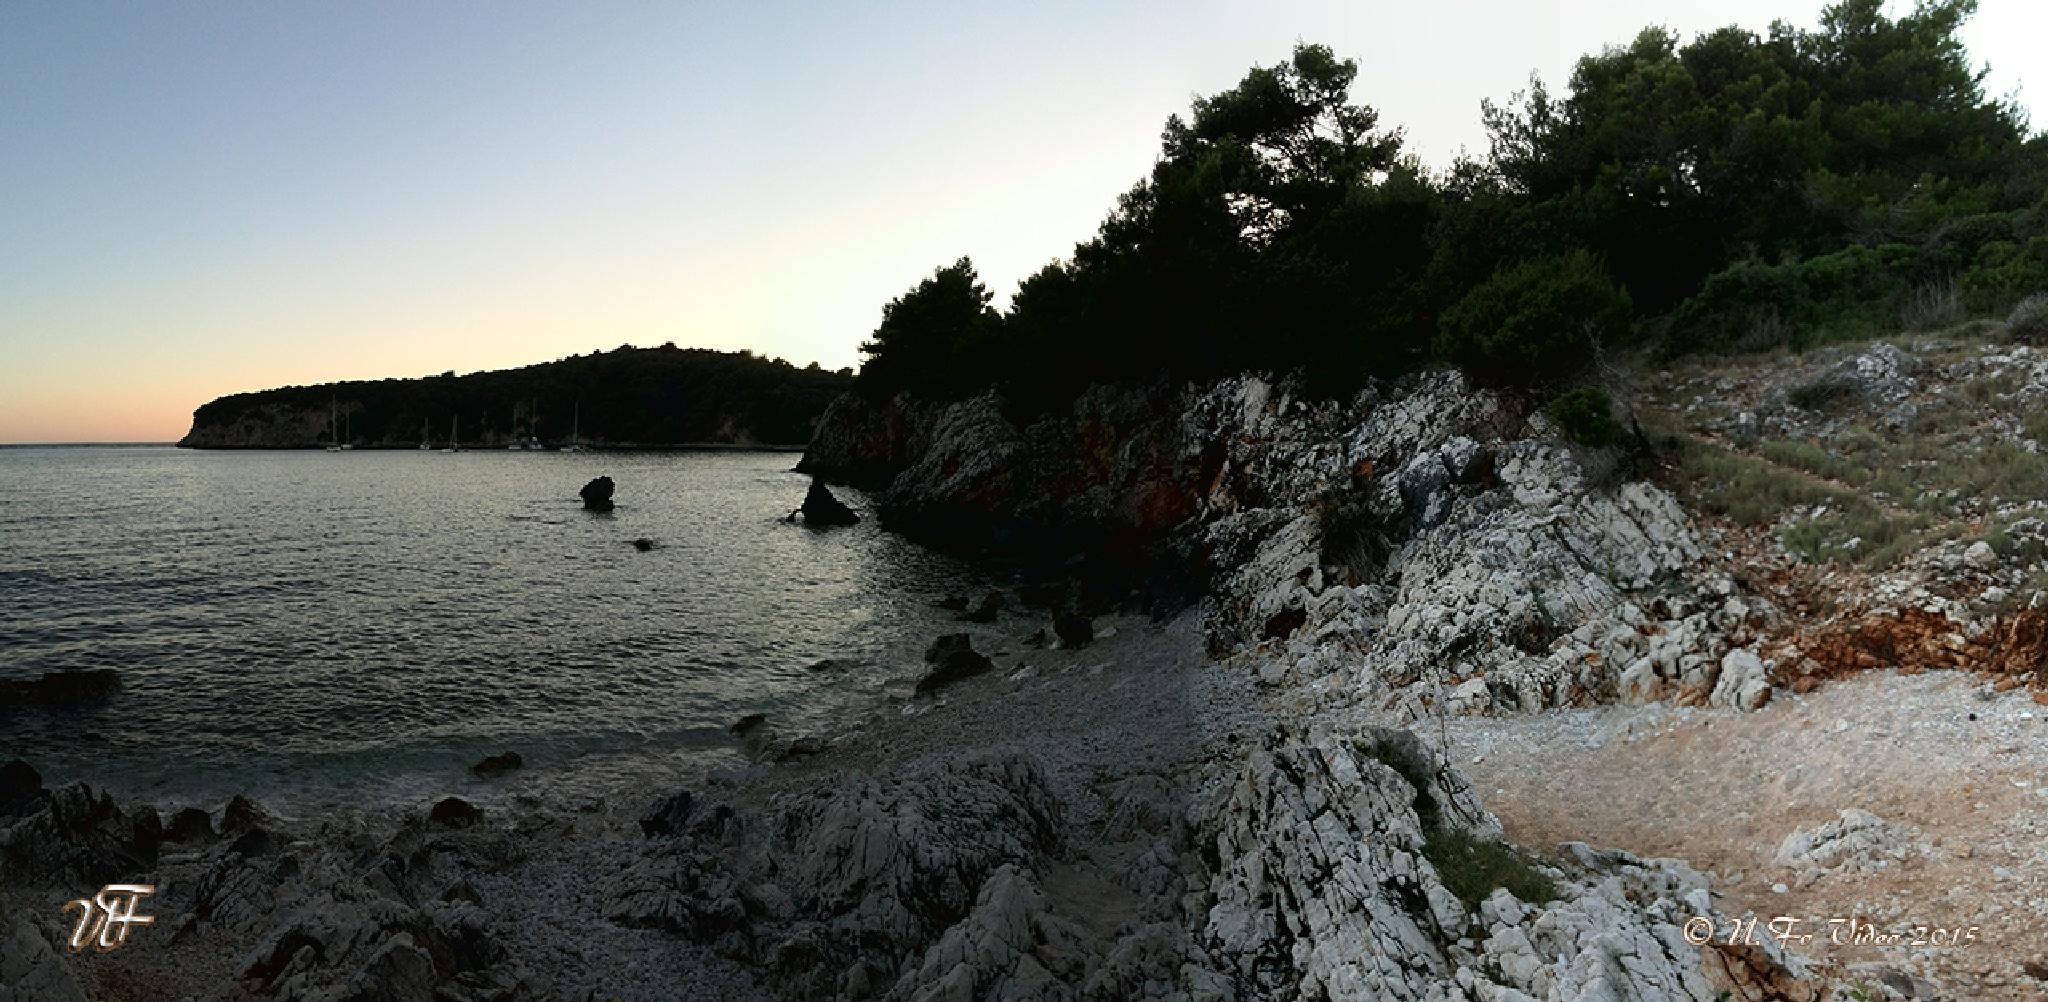 Panoramica_2 by Umberto Fontana